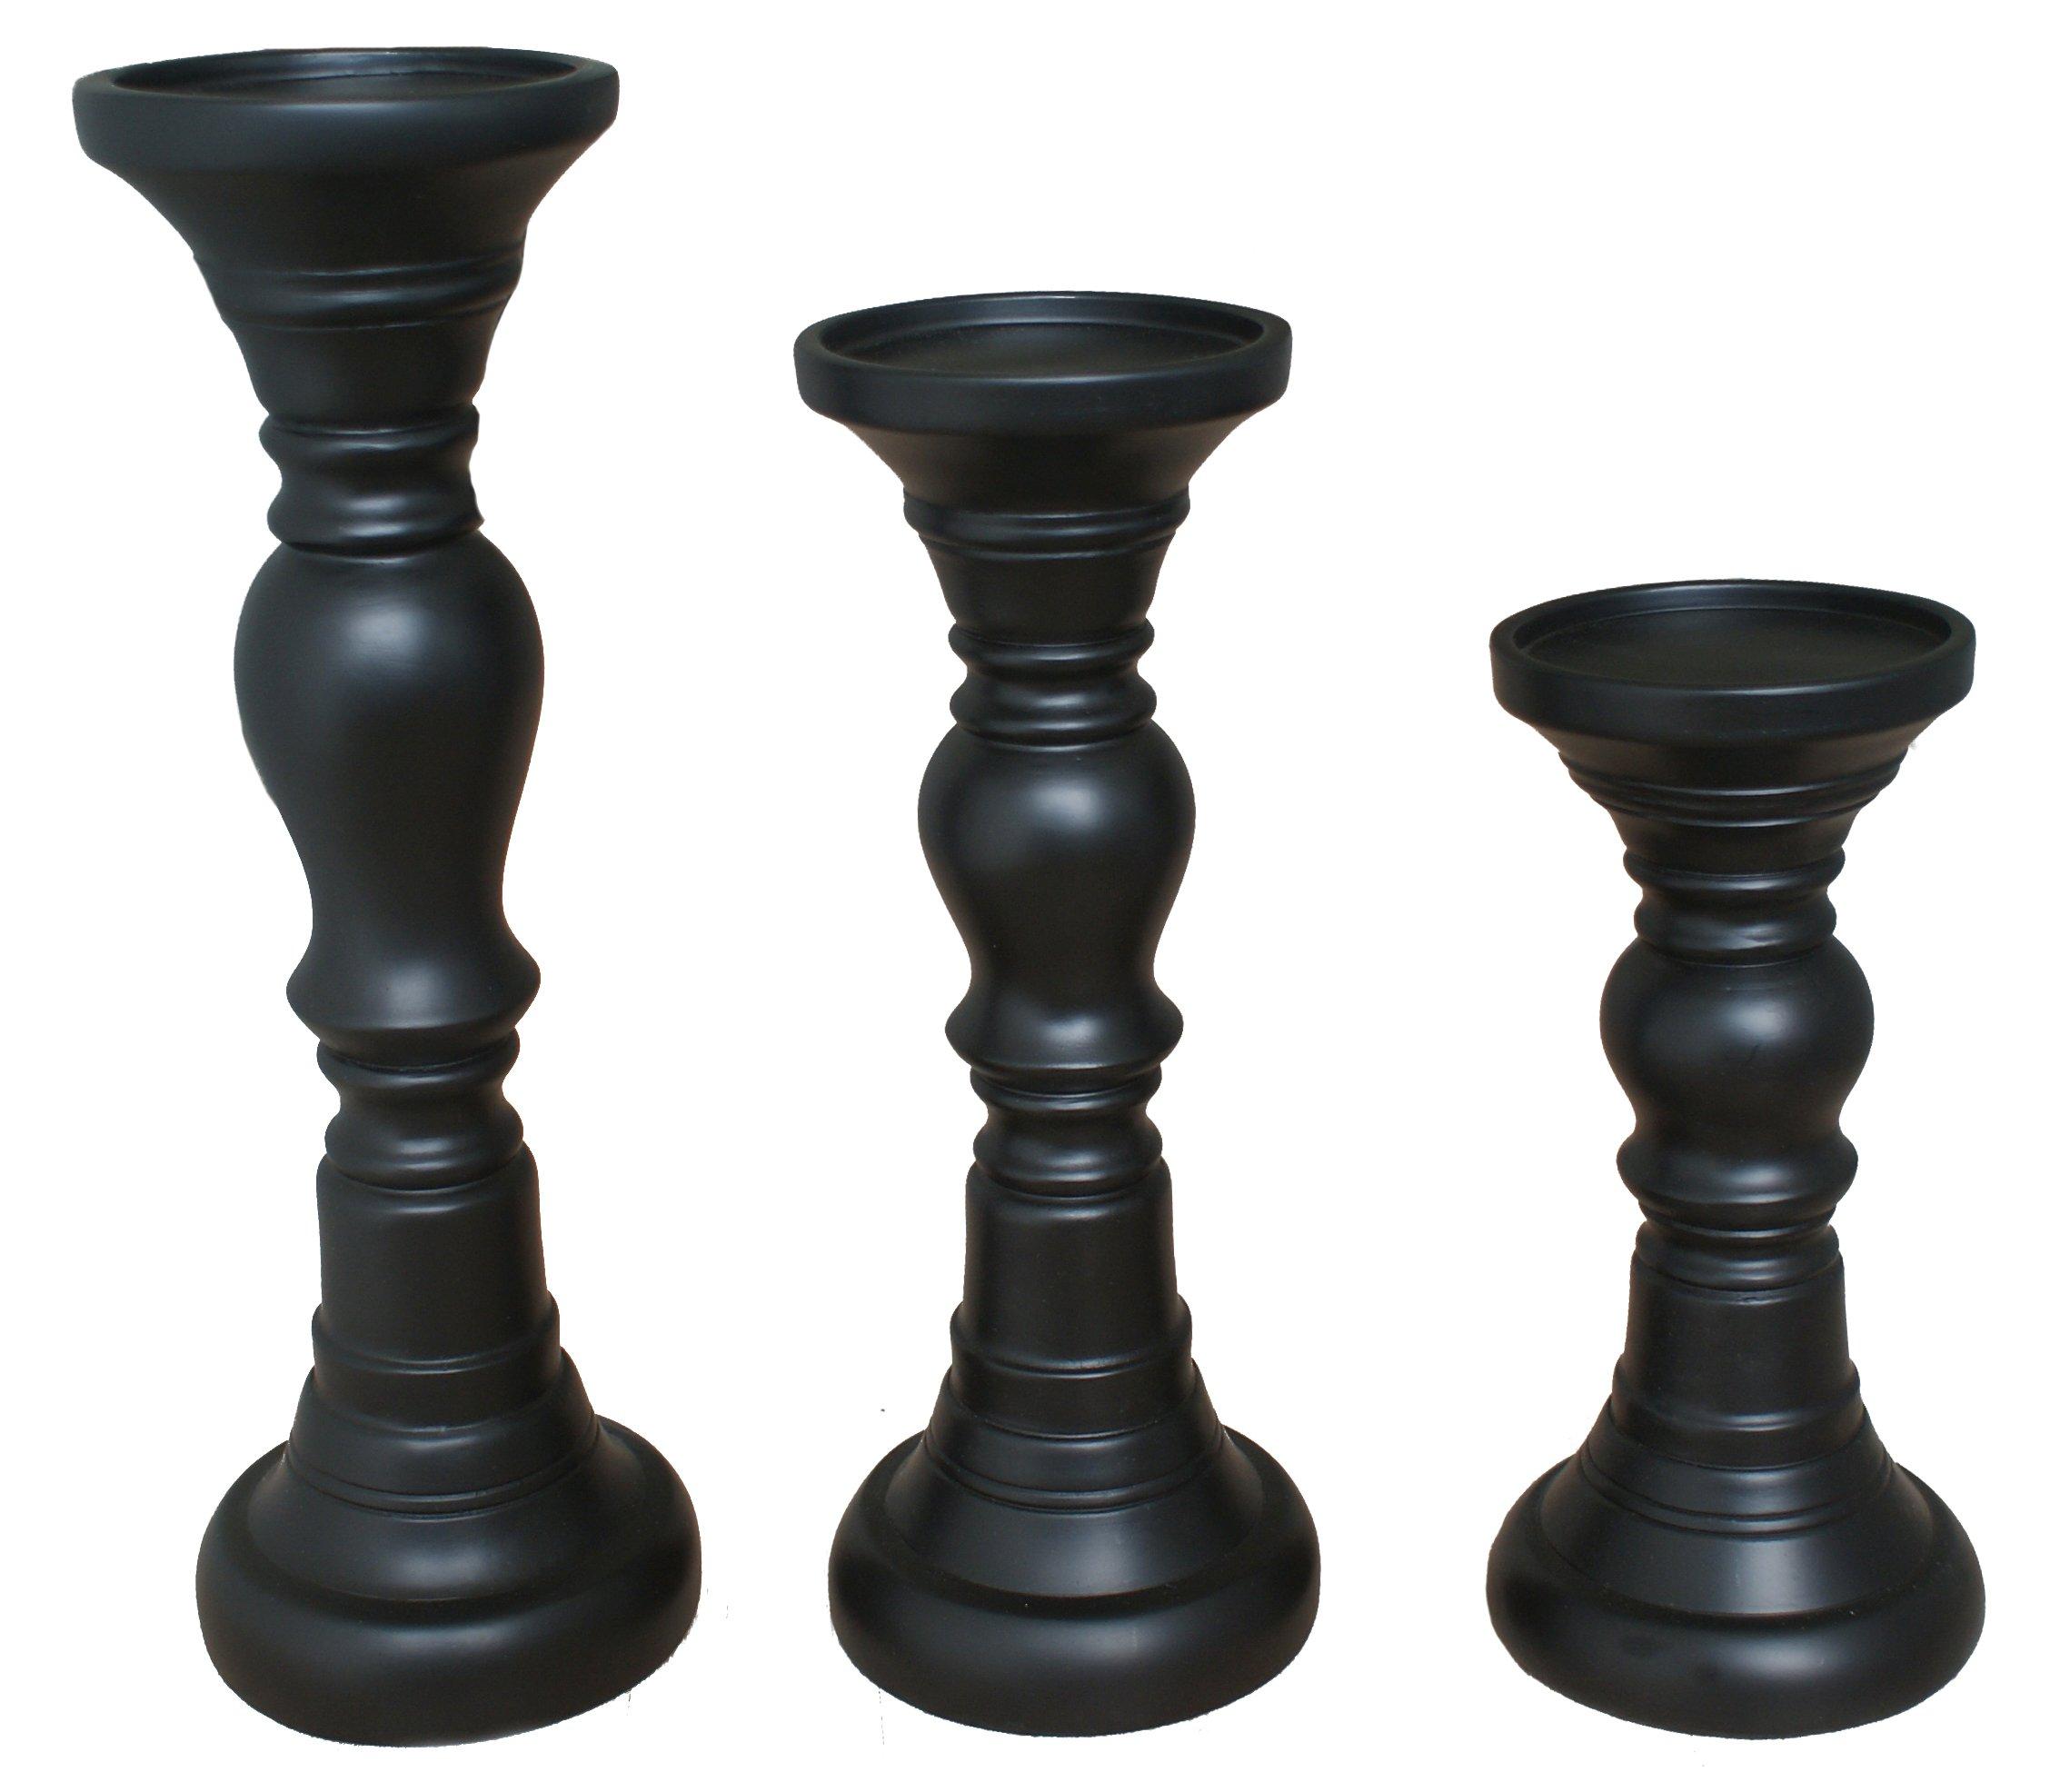 TIAAN's Set of 3 Resin Clasic Pillar Candle Holders - 12'', 10'', 8''